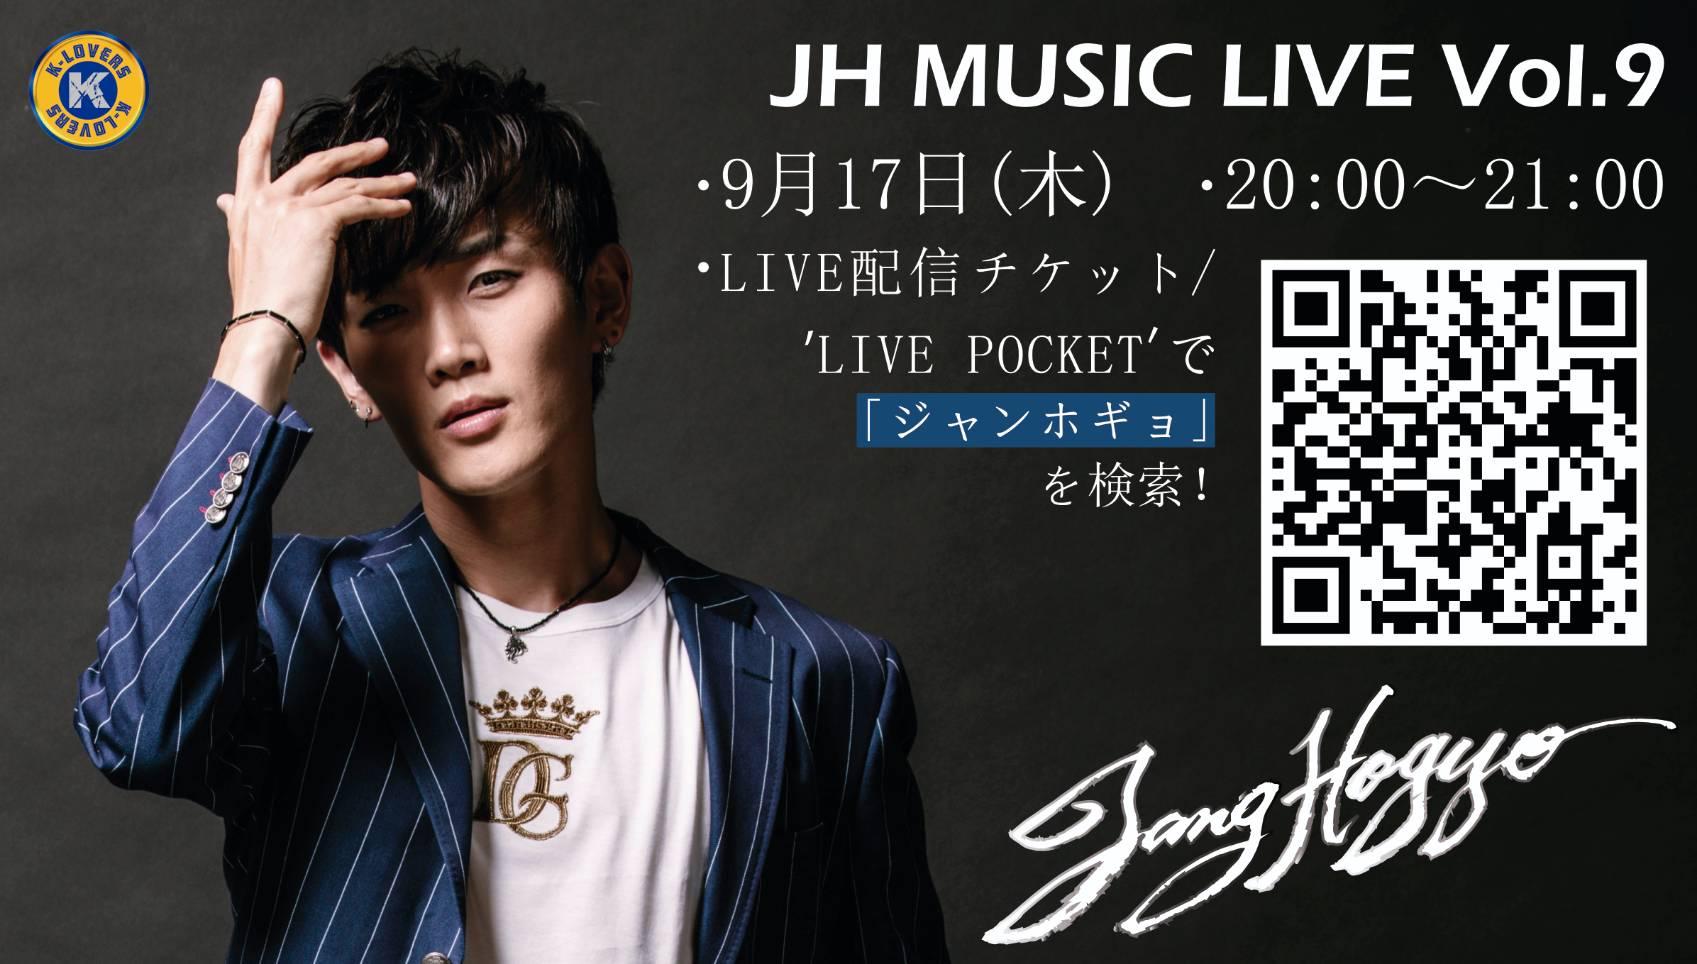 JH MUSIC LIVE Vol.9